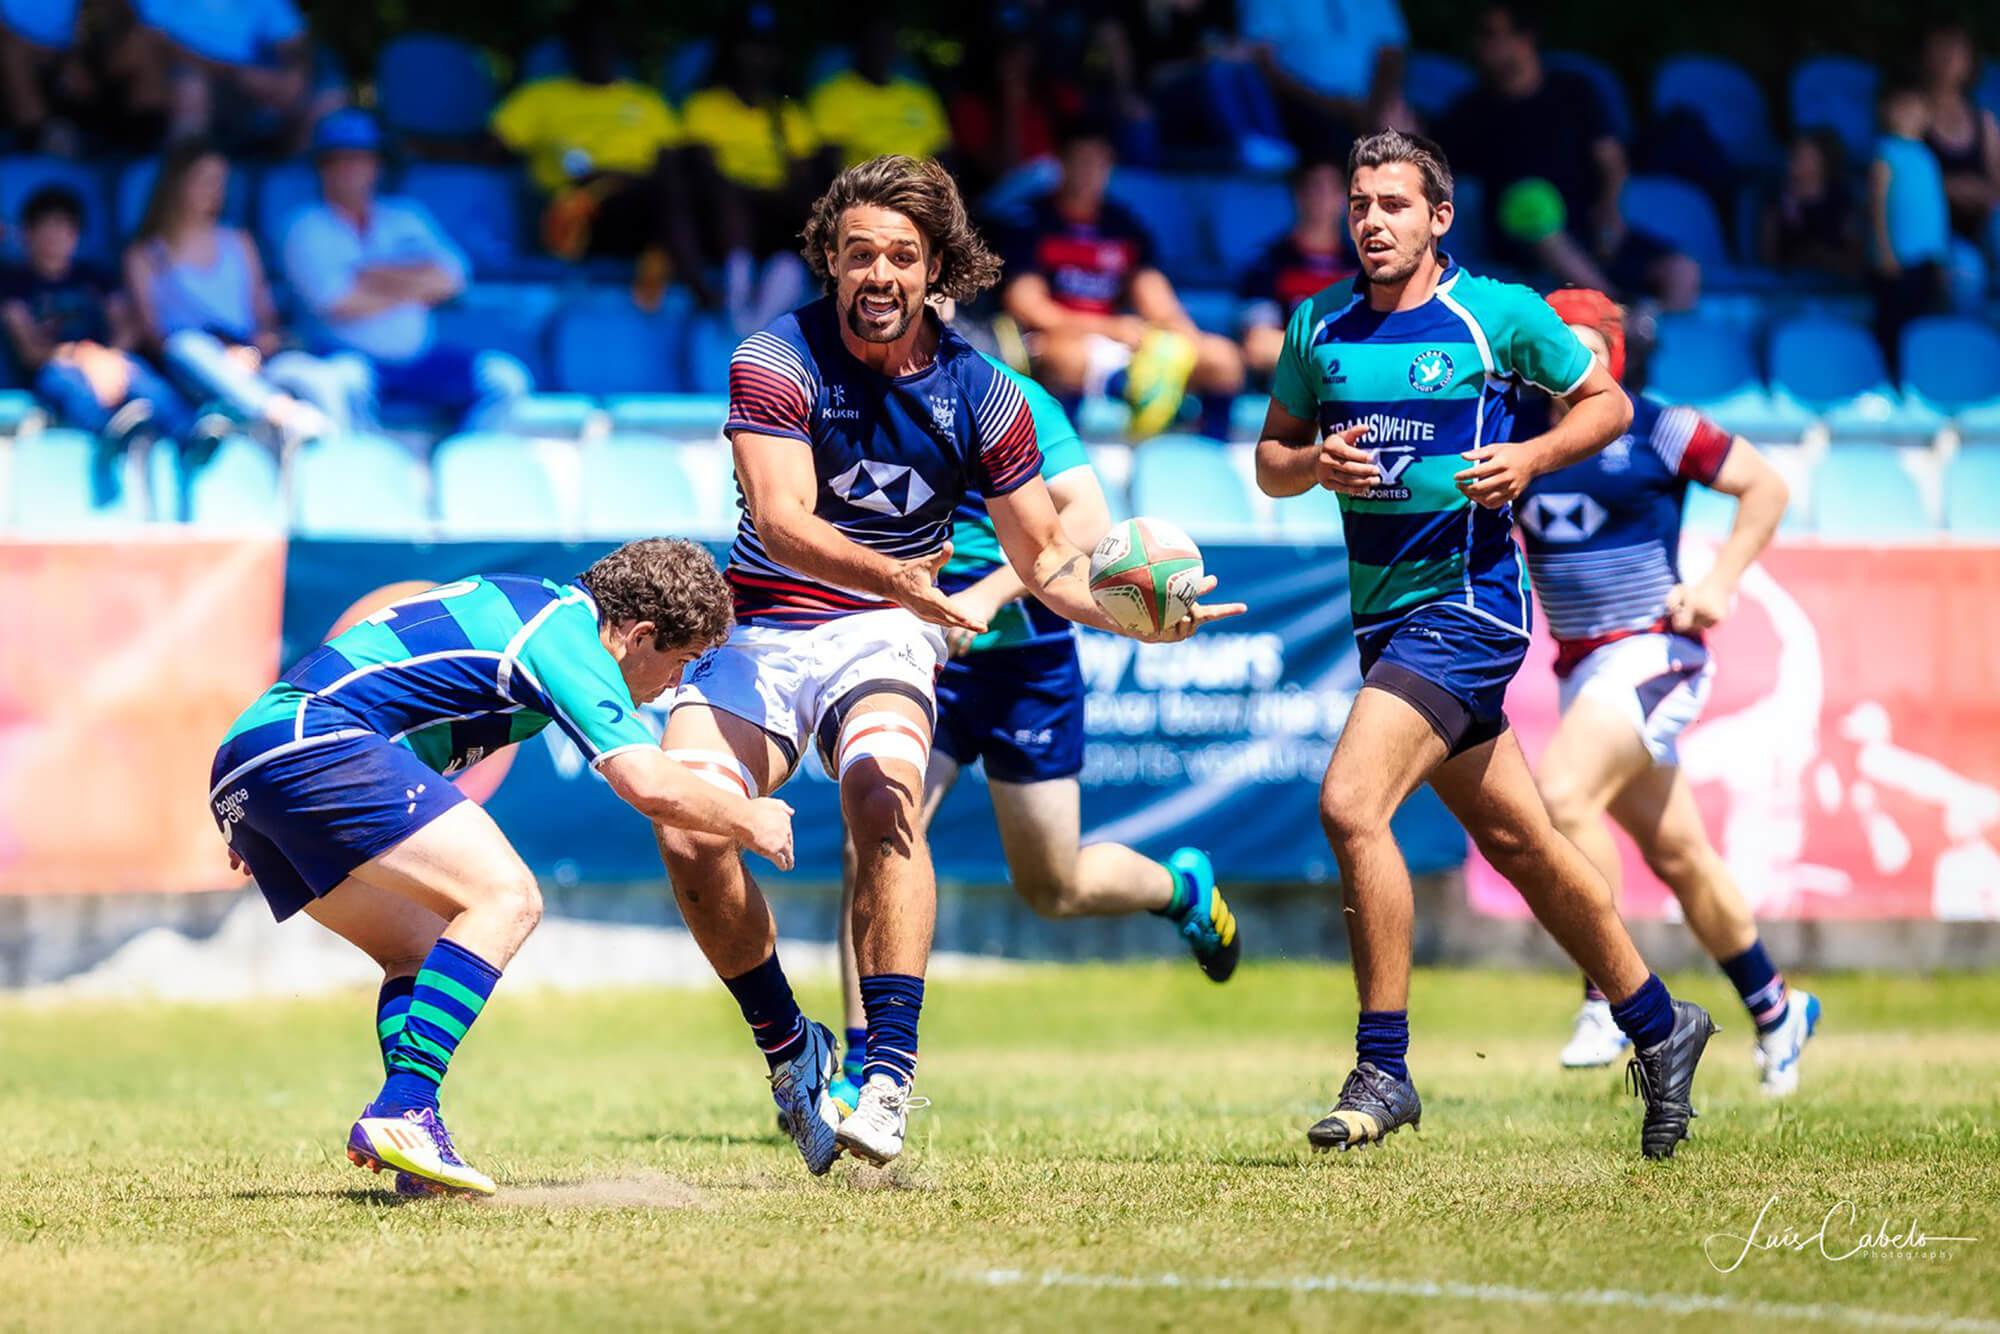 Lisboa-Sevens-Rugby-Tournament-Portugal-5